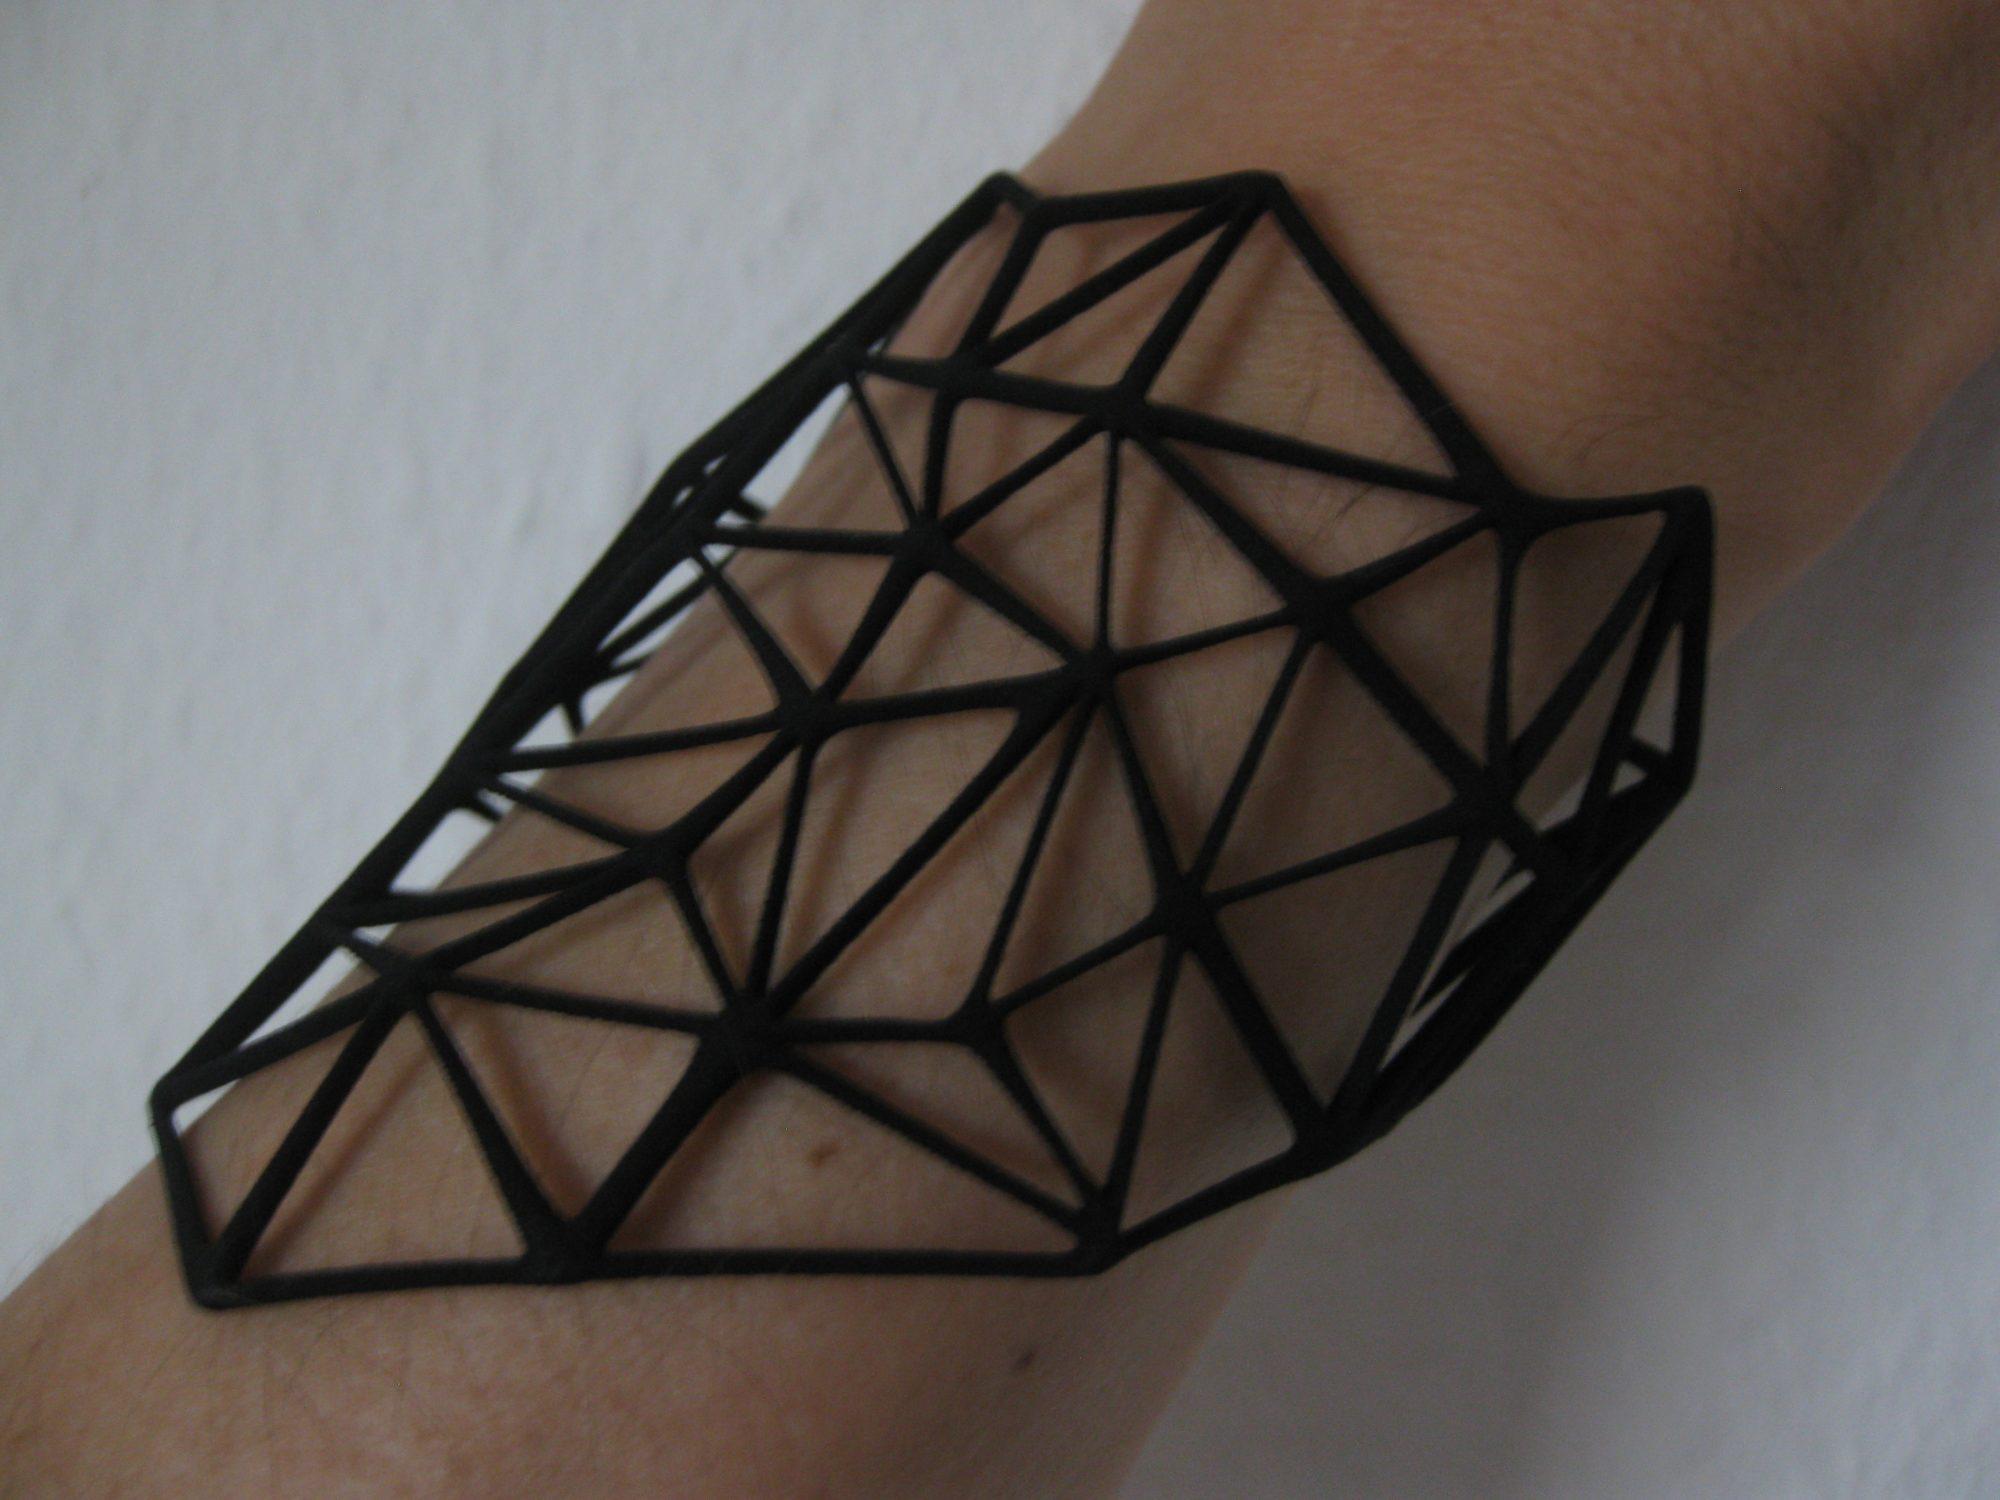 Detail of the PLA bracelet